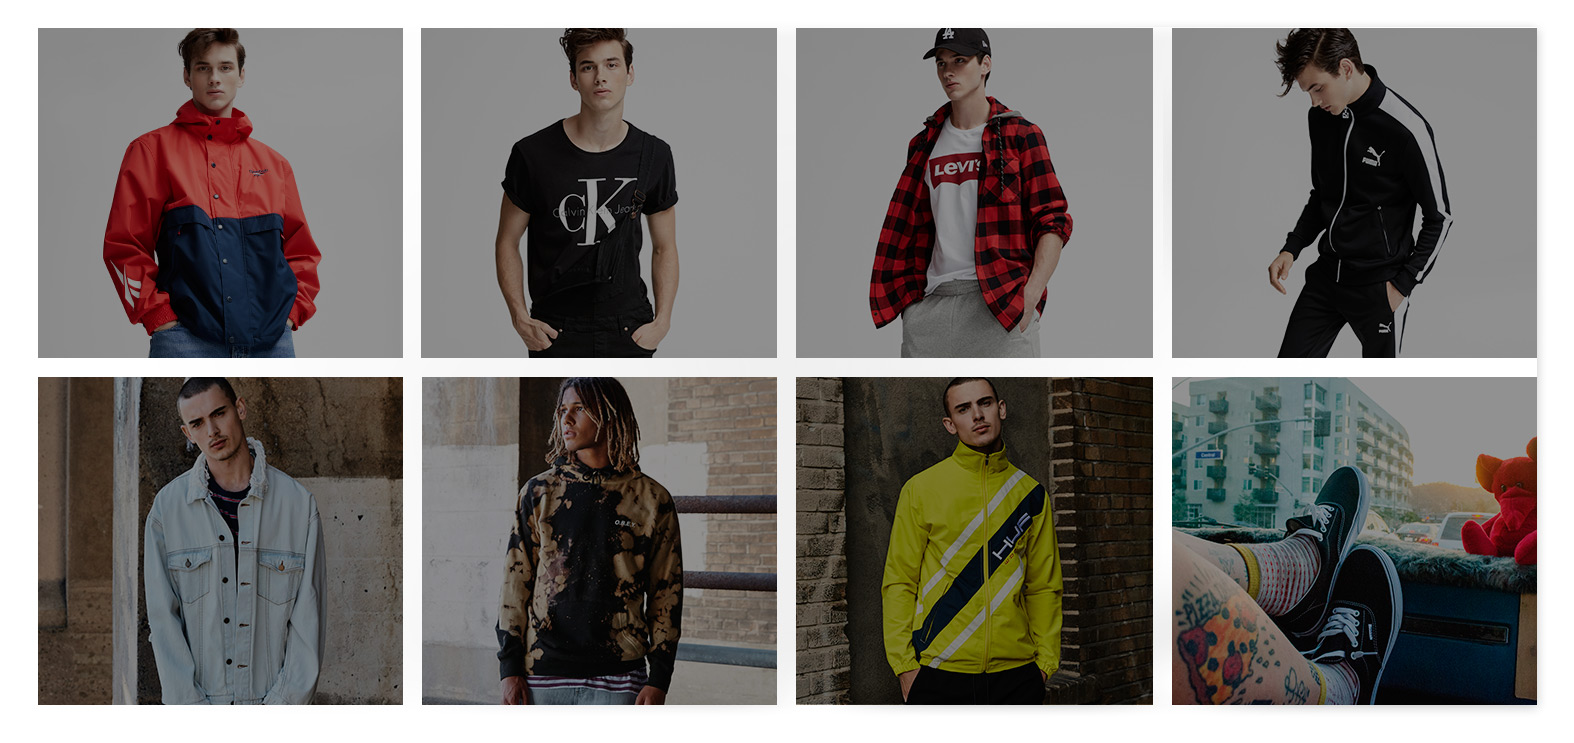 Clothing According to Body Type